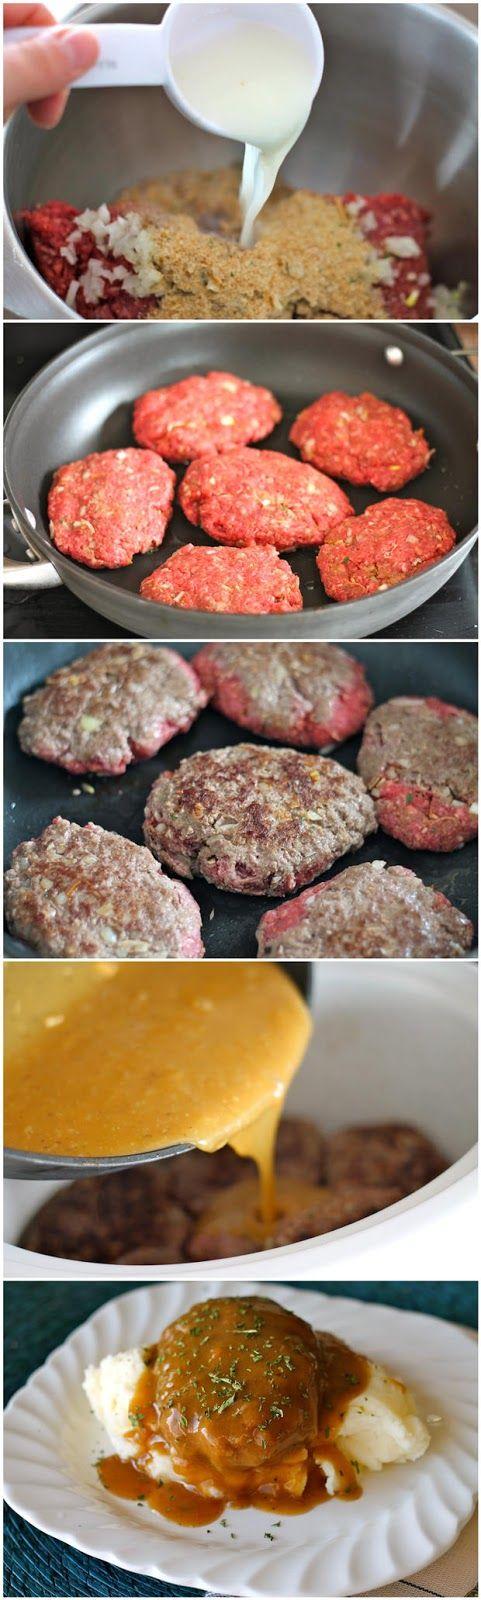 Slow Cooker Salisbury Steaks